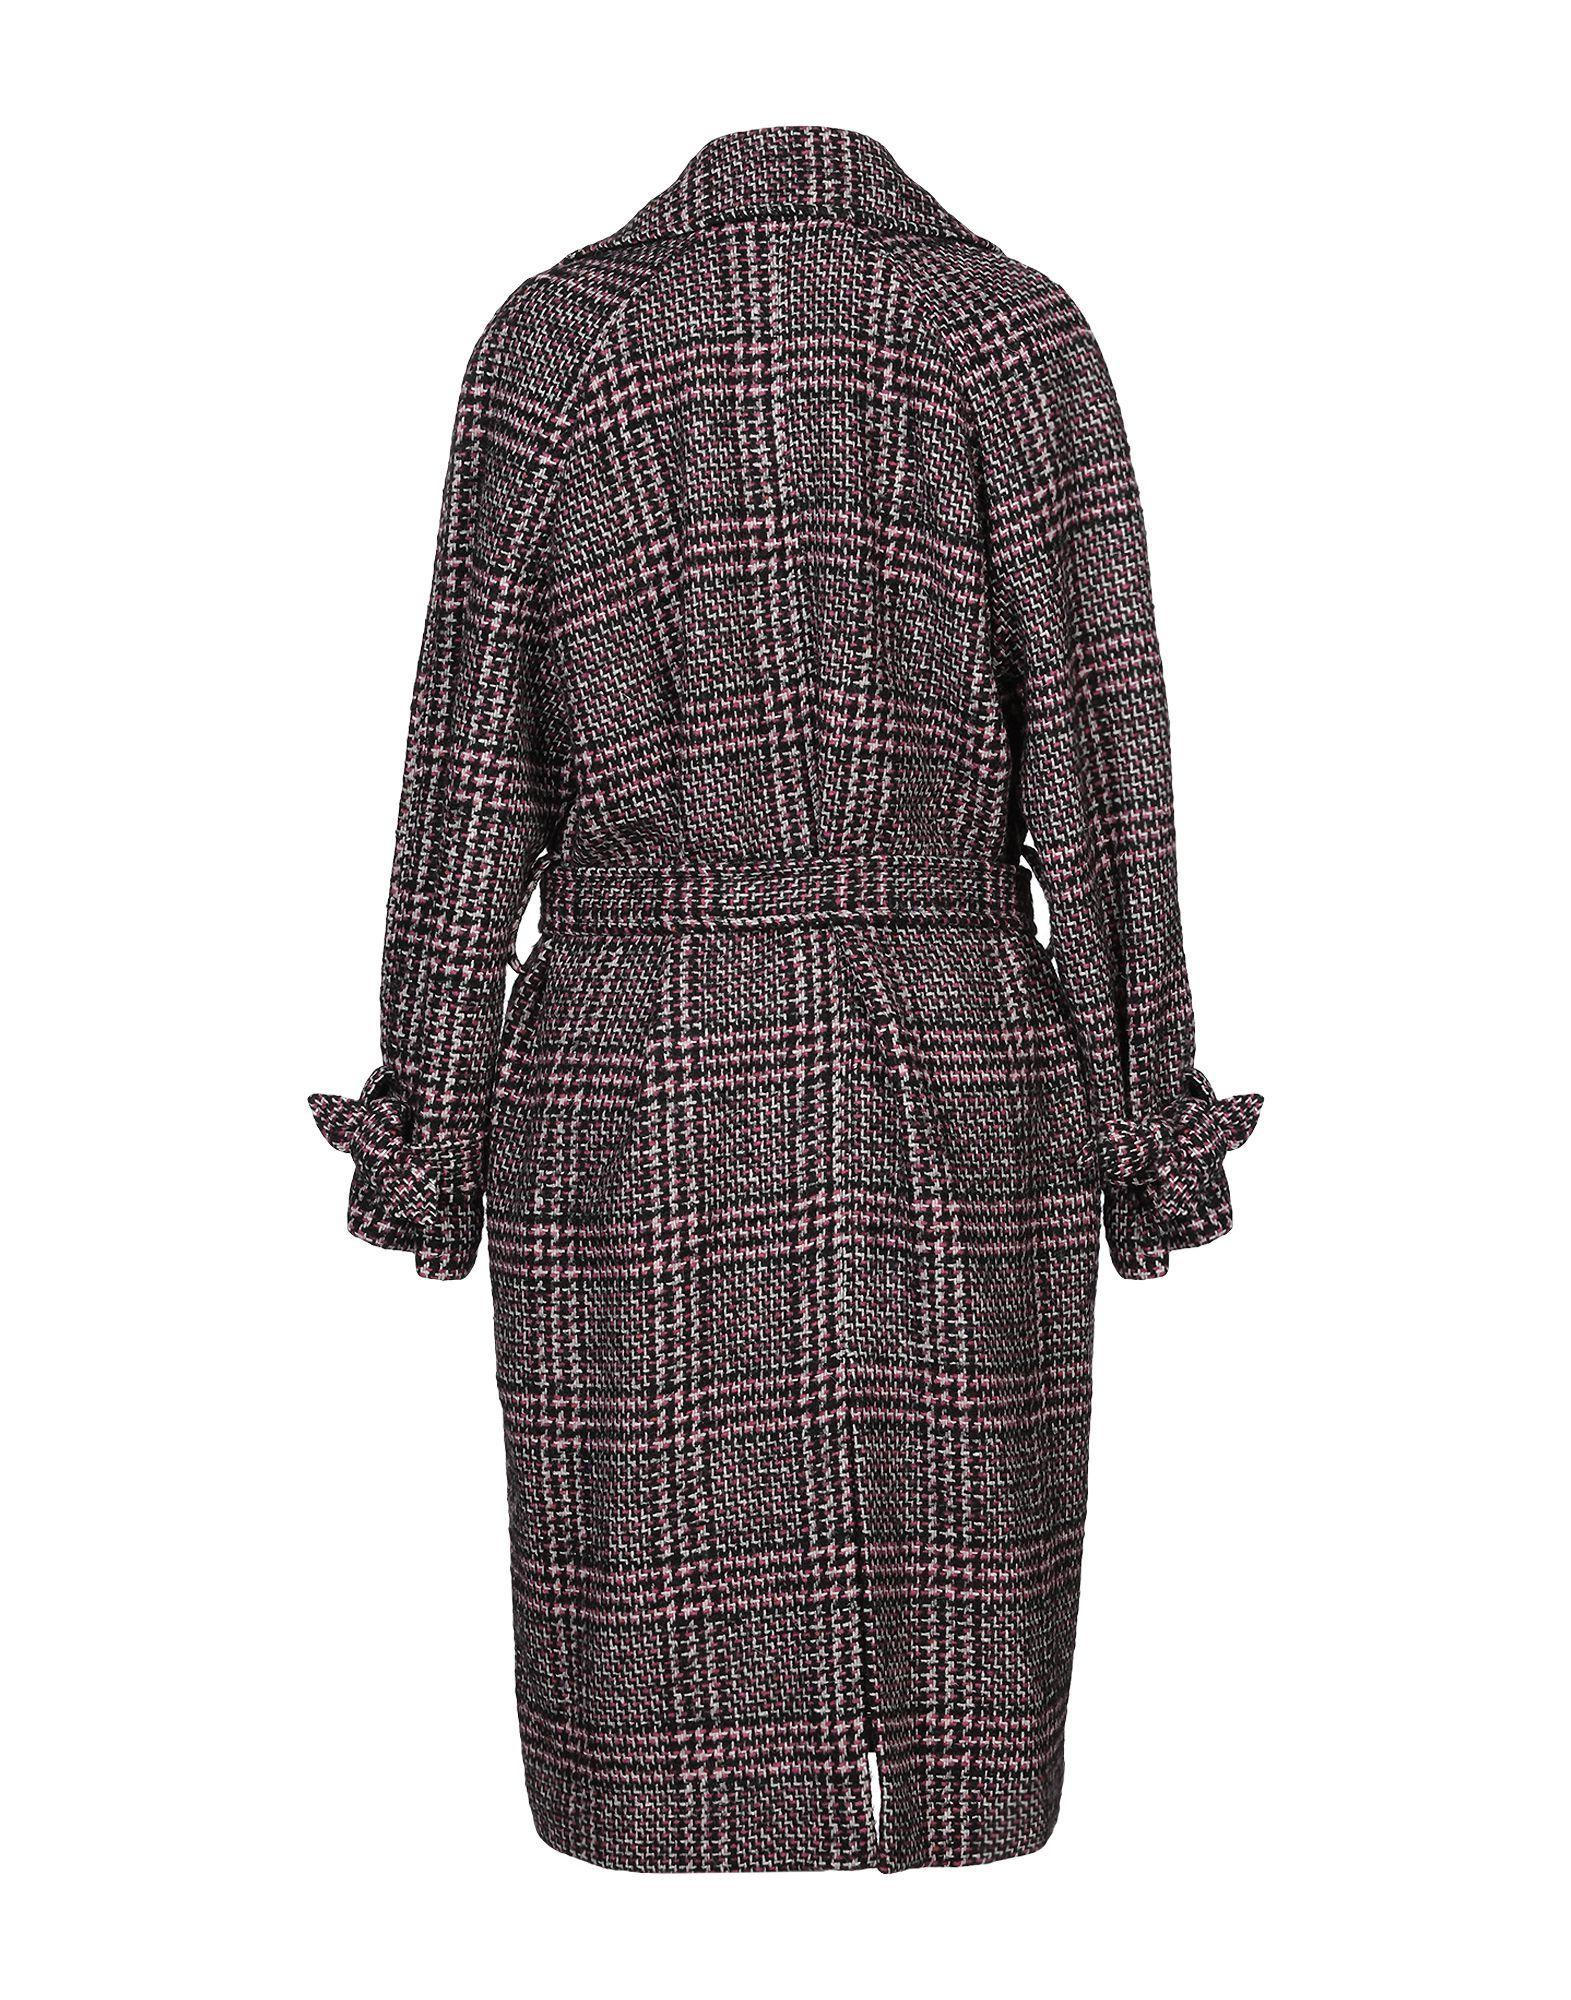 COATS & JACKETS 8Pm Black Woman Wool